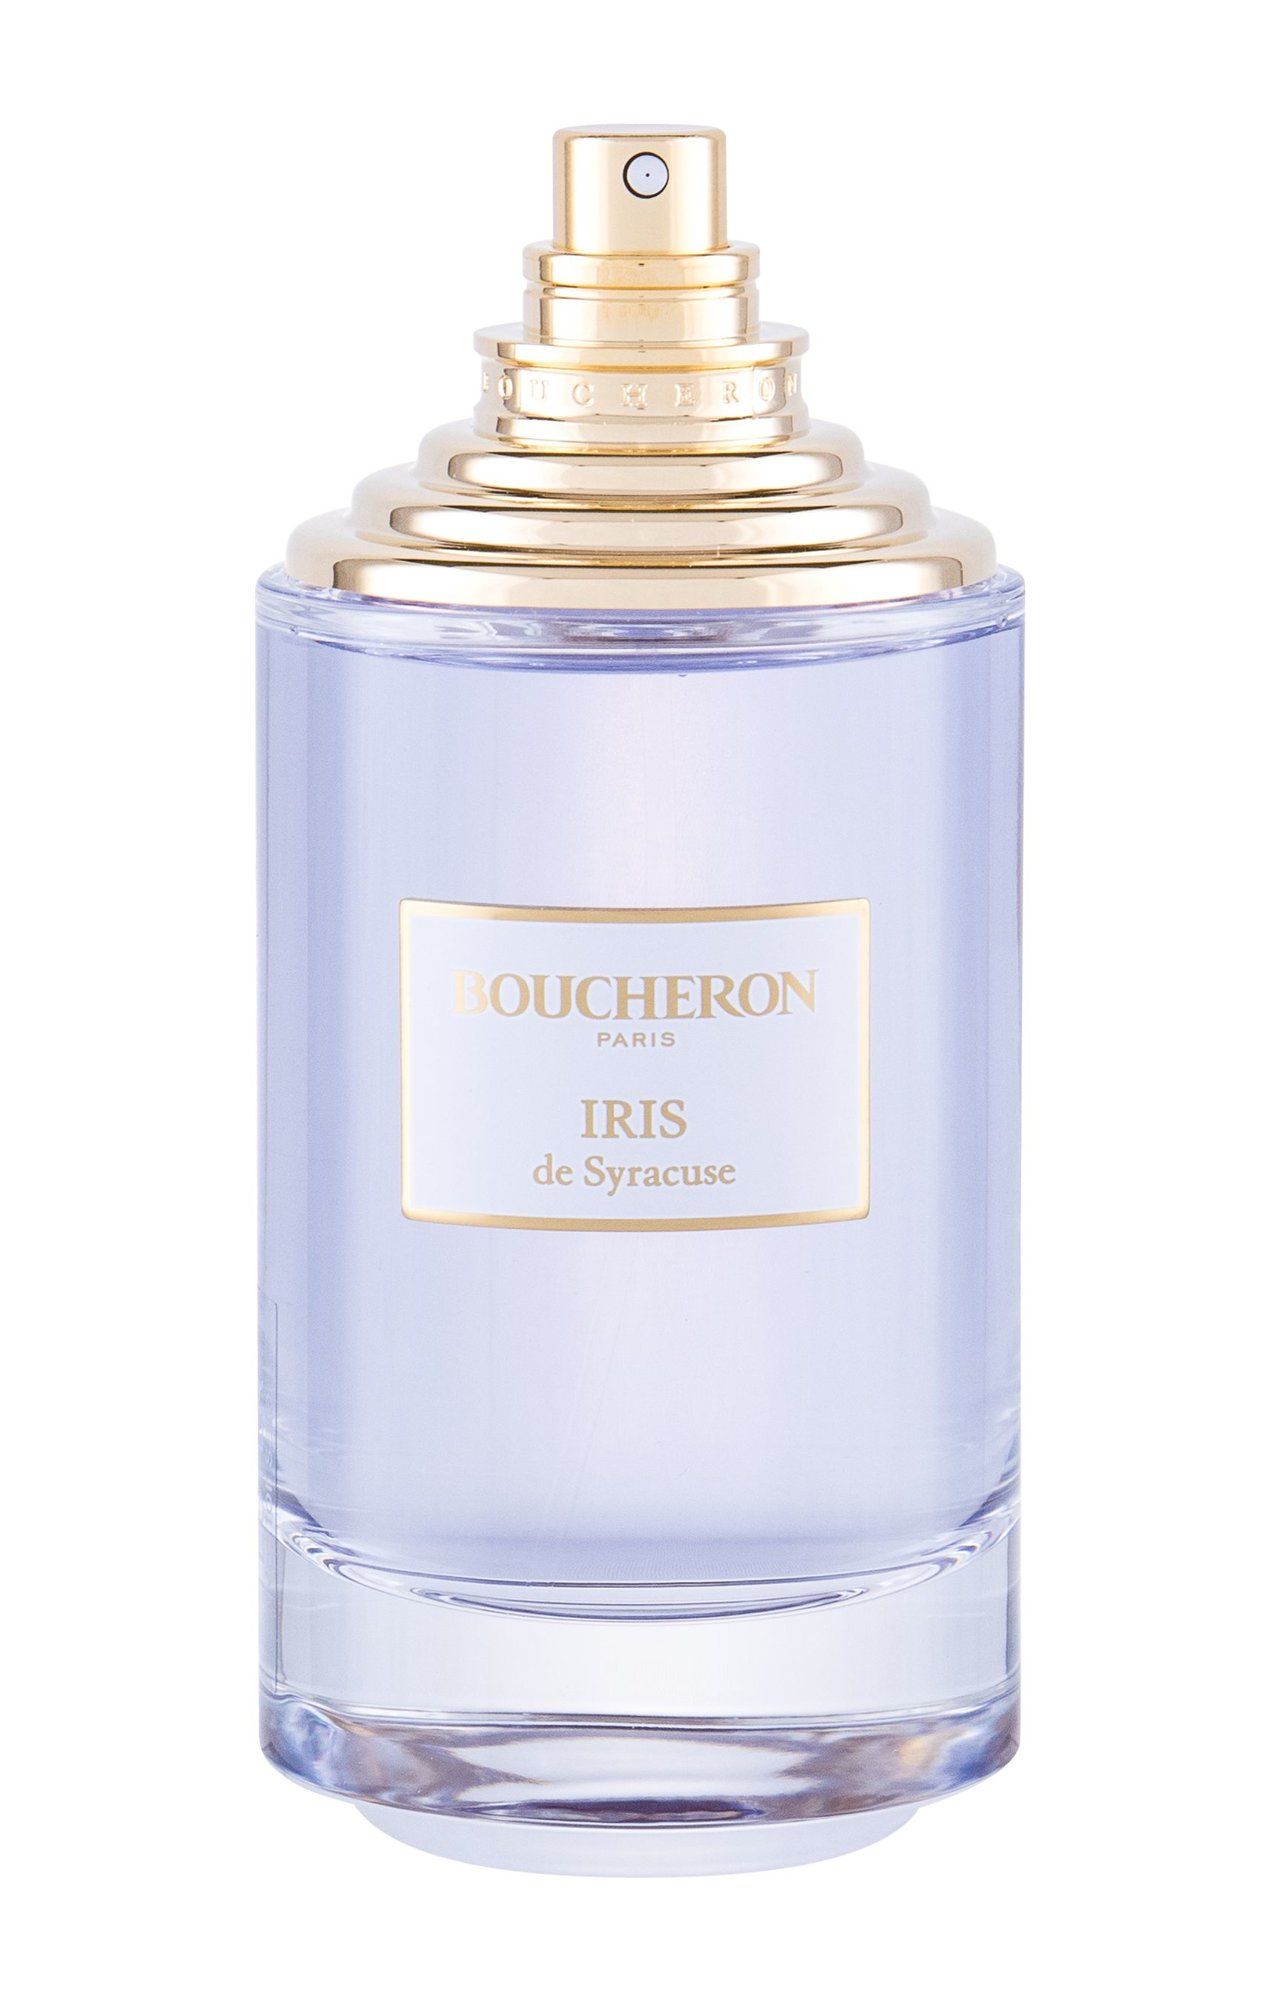 Boucheron La Collection Iris de Syracuse, Parfumovaná voda 125ml, Tester